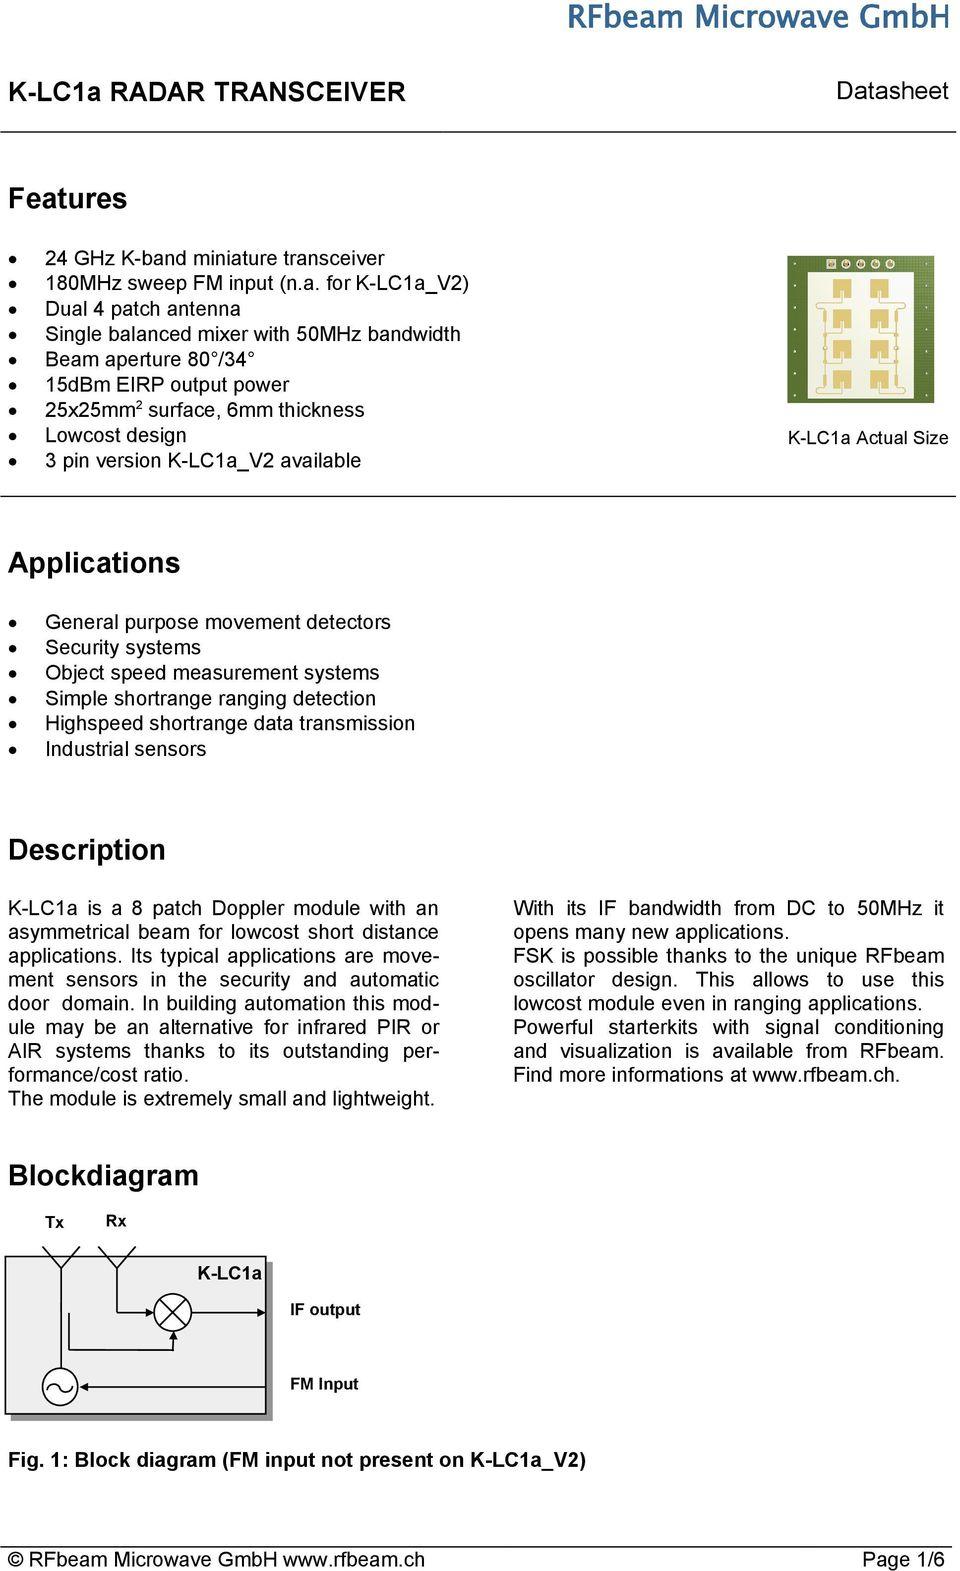 medium resolution of simple shortrange ranging detection highspeed shortrange data transmission industrial sensors description k lc1a is a